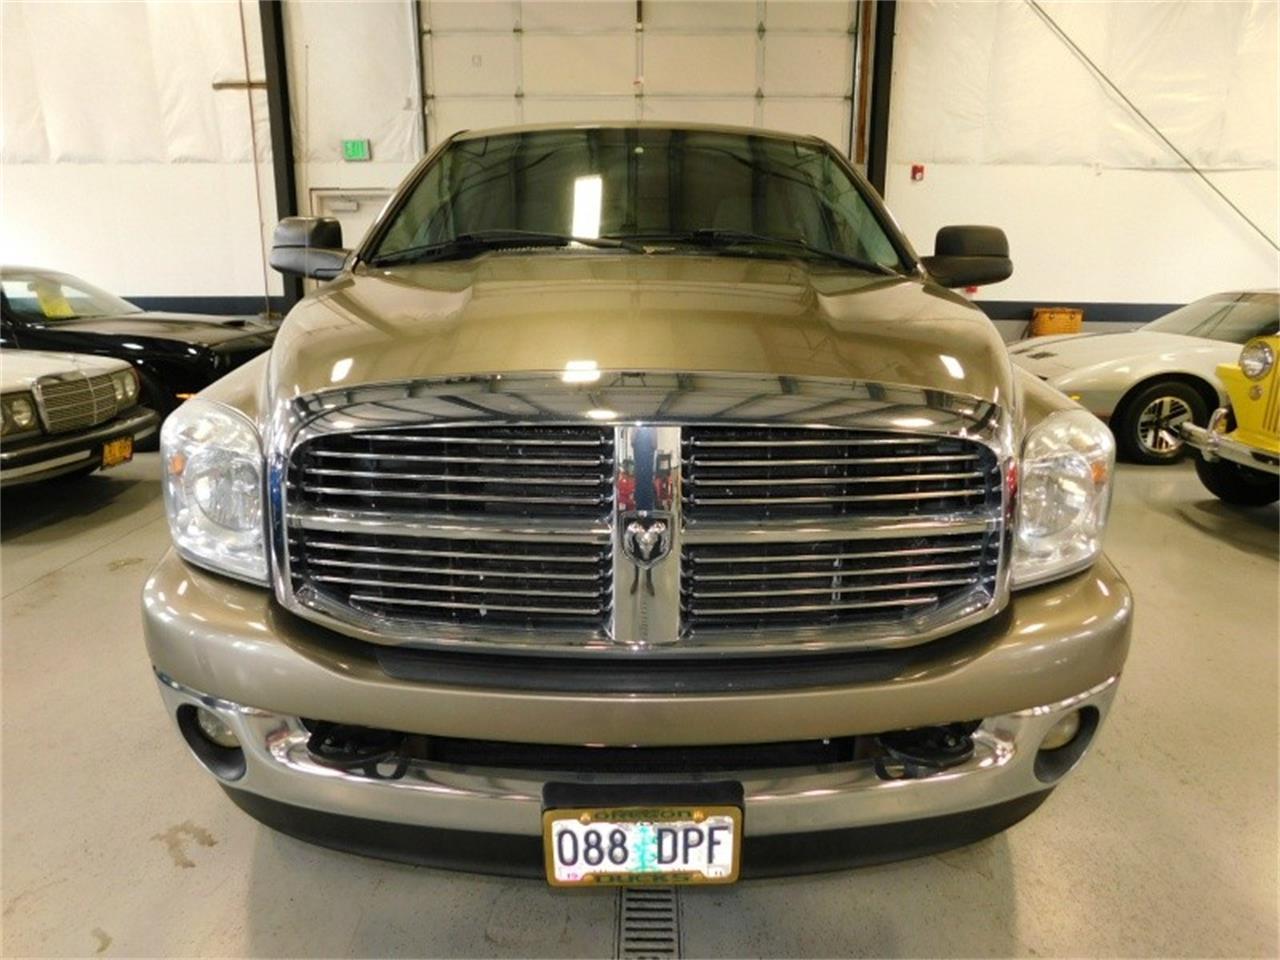 2008 Dodge Ram 2500 (CC-1229189) for sale in Bend, Oregon